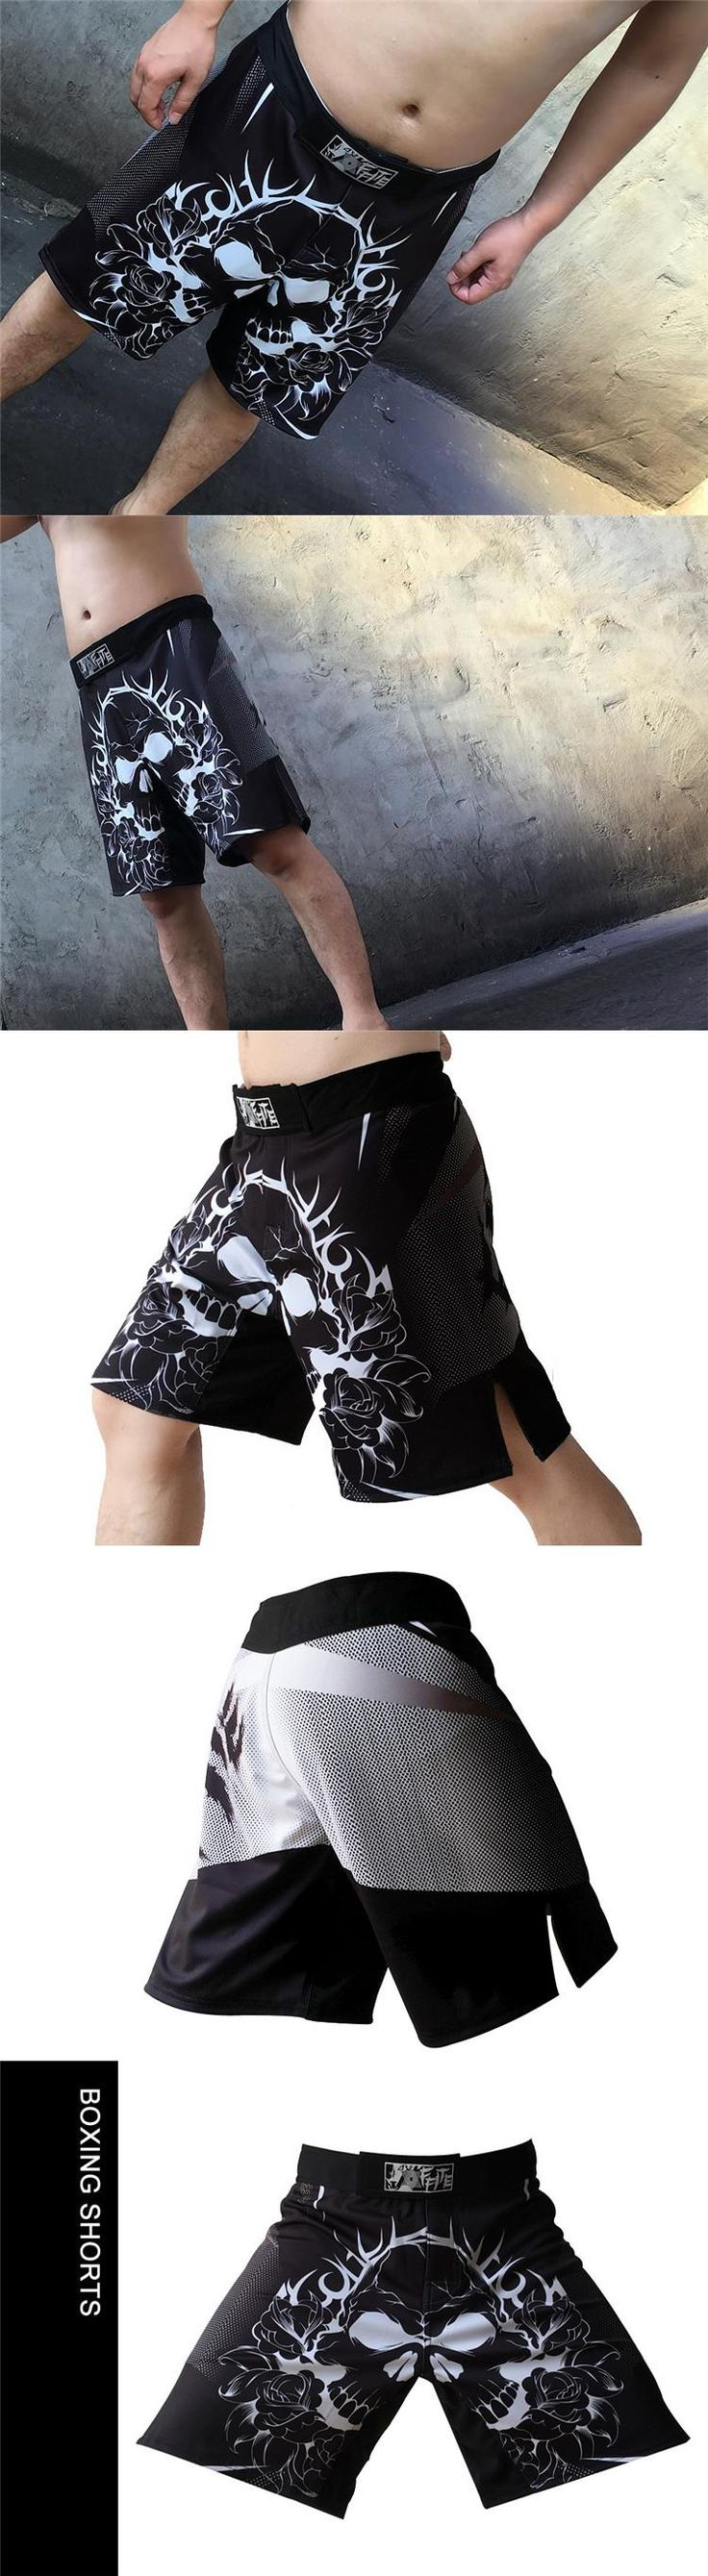 cash commodity MMA  Fitness Sanda fighting TIGER  Muay Thai shorts boxer shorts Size